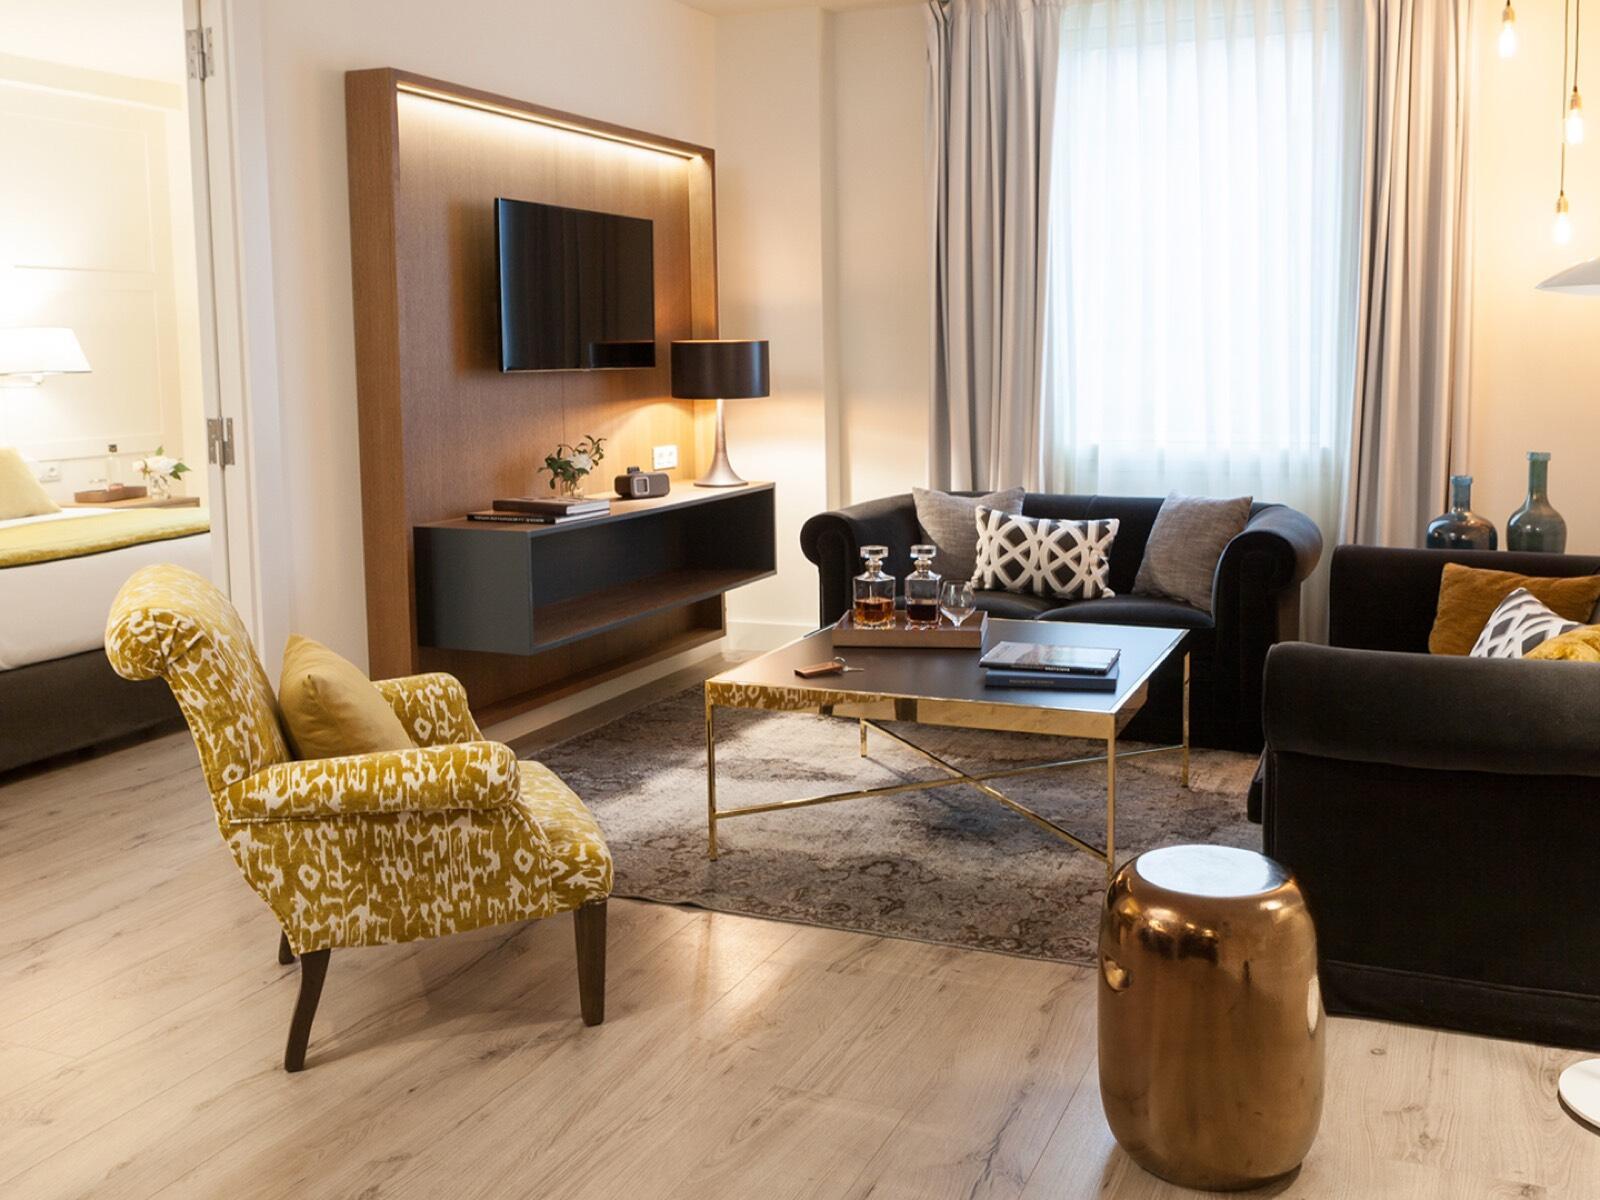 Gallery Hotel, Barcelona